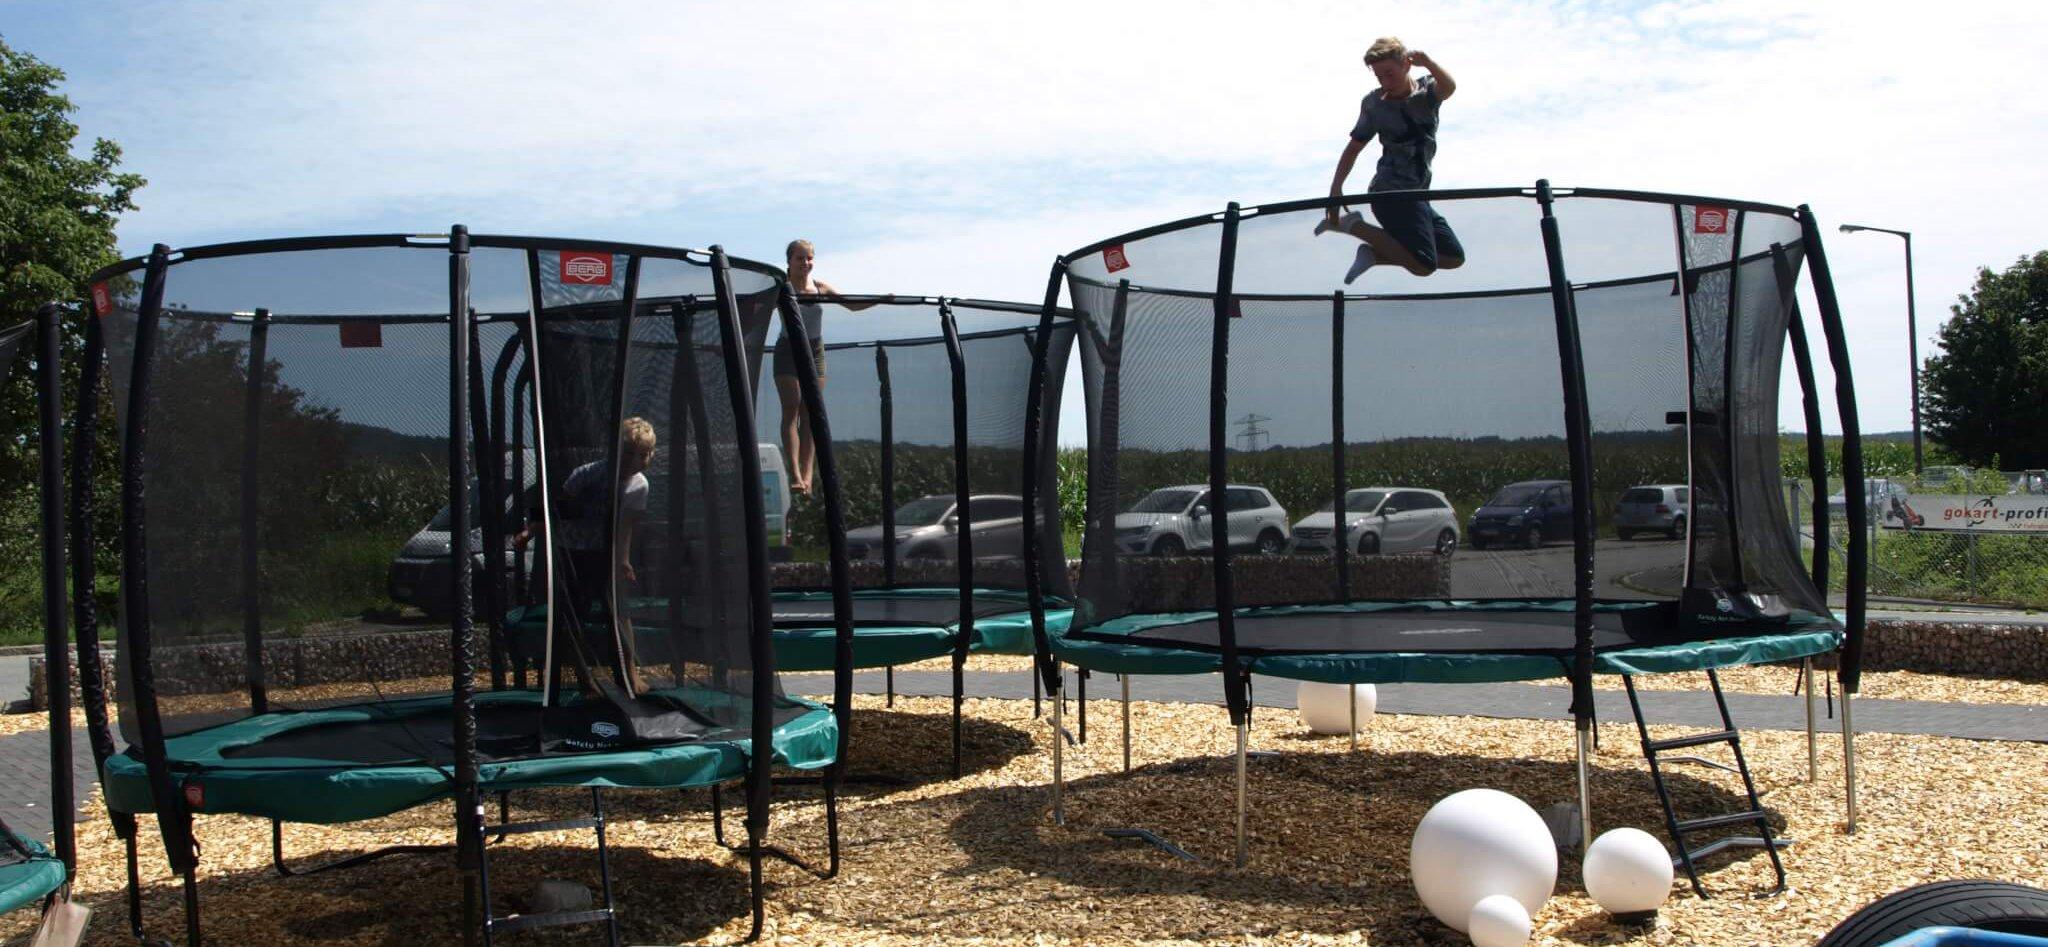 Volle Kanne - Dreh bei trampolin-profi.de Nürnberg